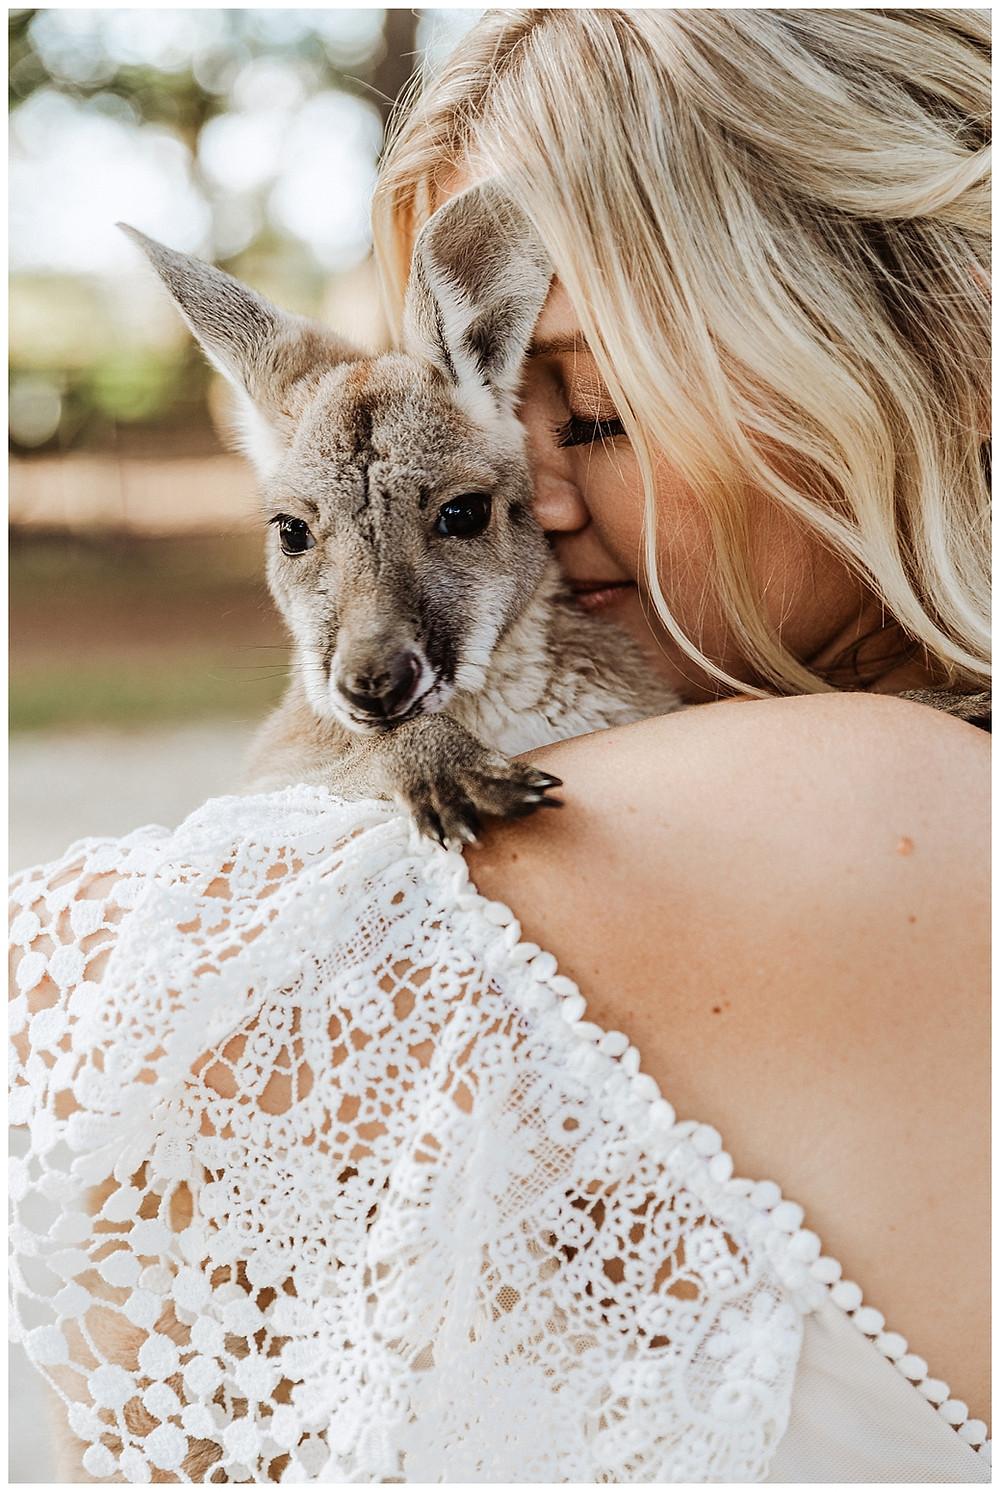 Bridal Portraits with Baby Kangaroo at Enchanted Oaks Farm in Ocala Florida